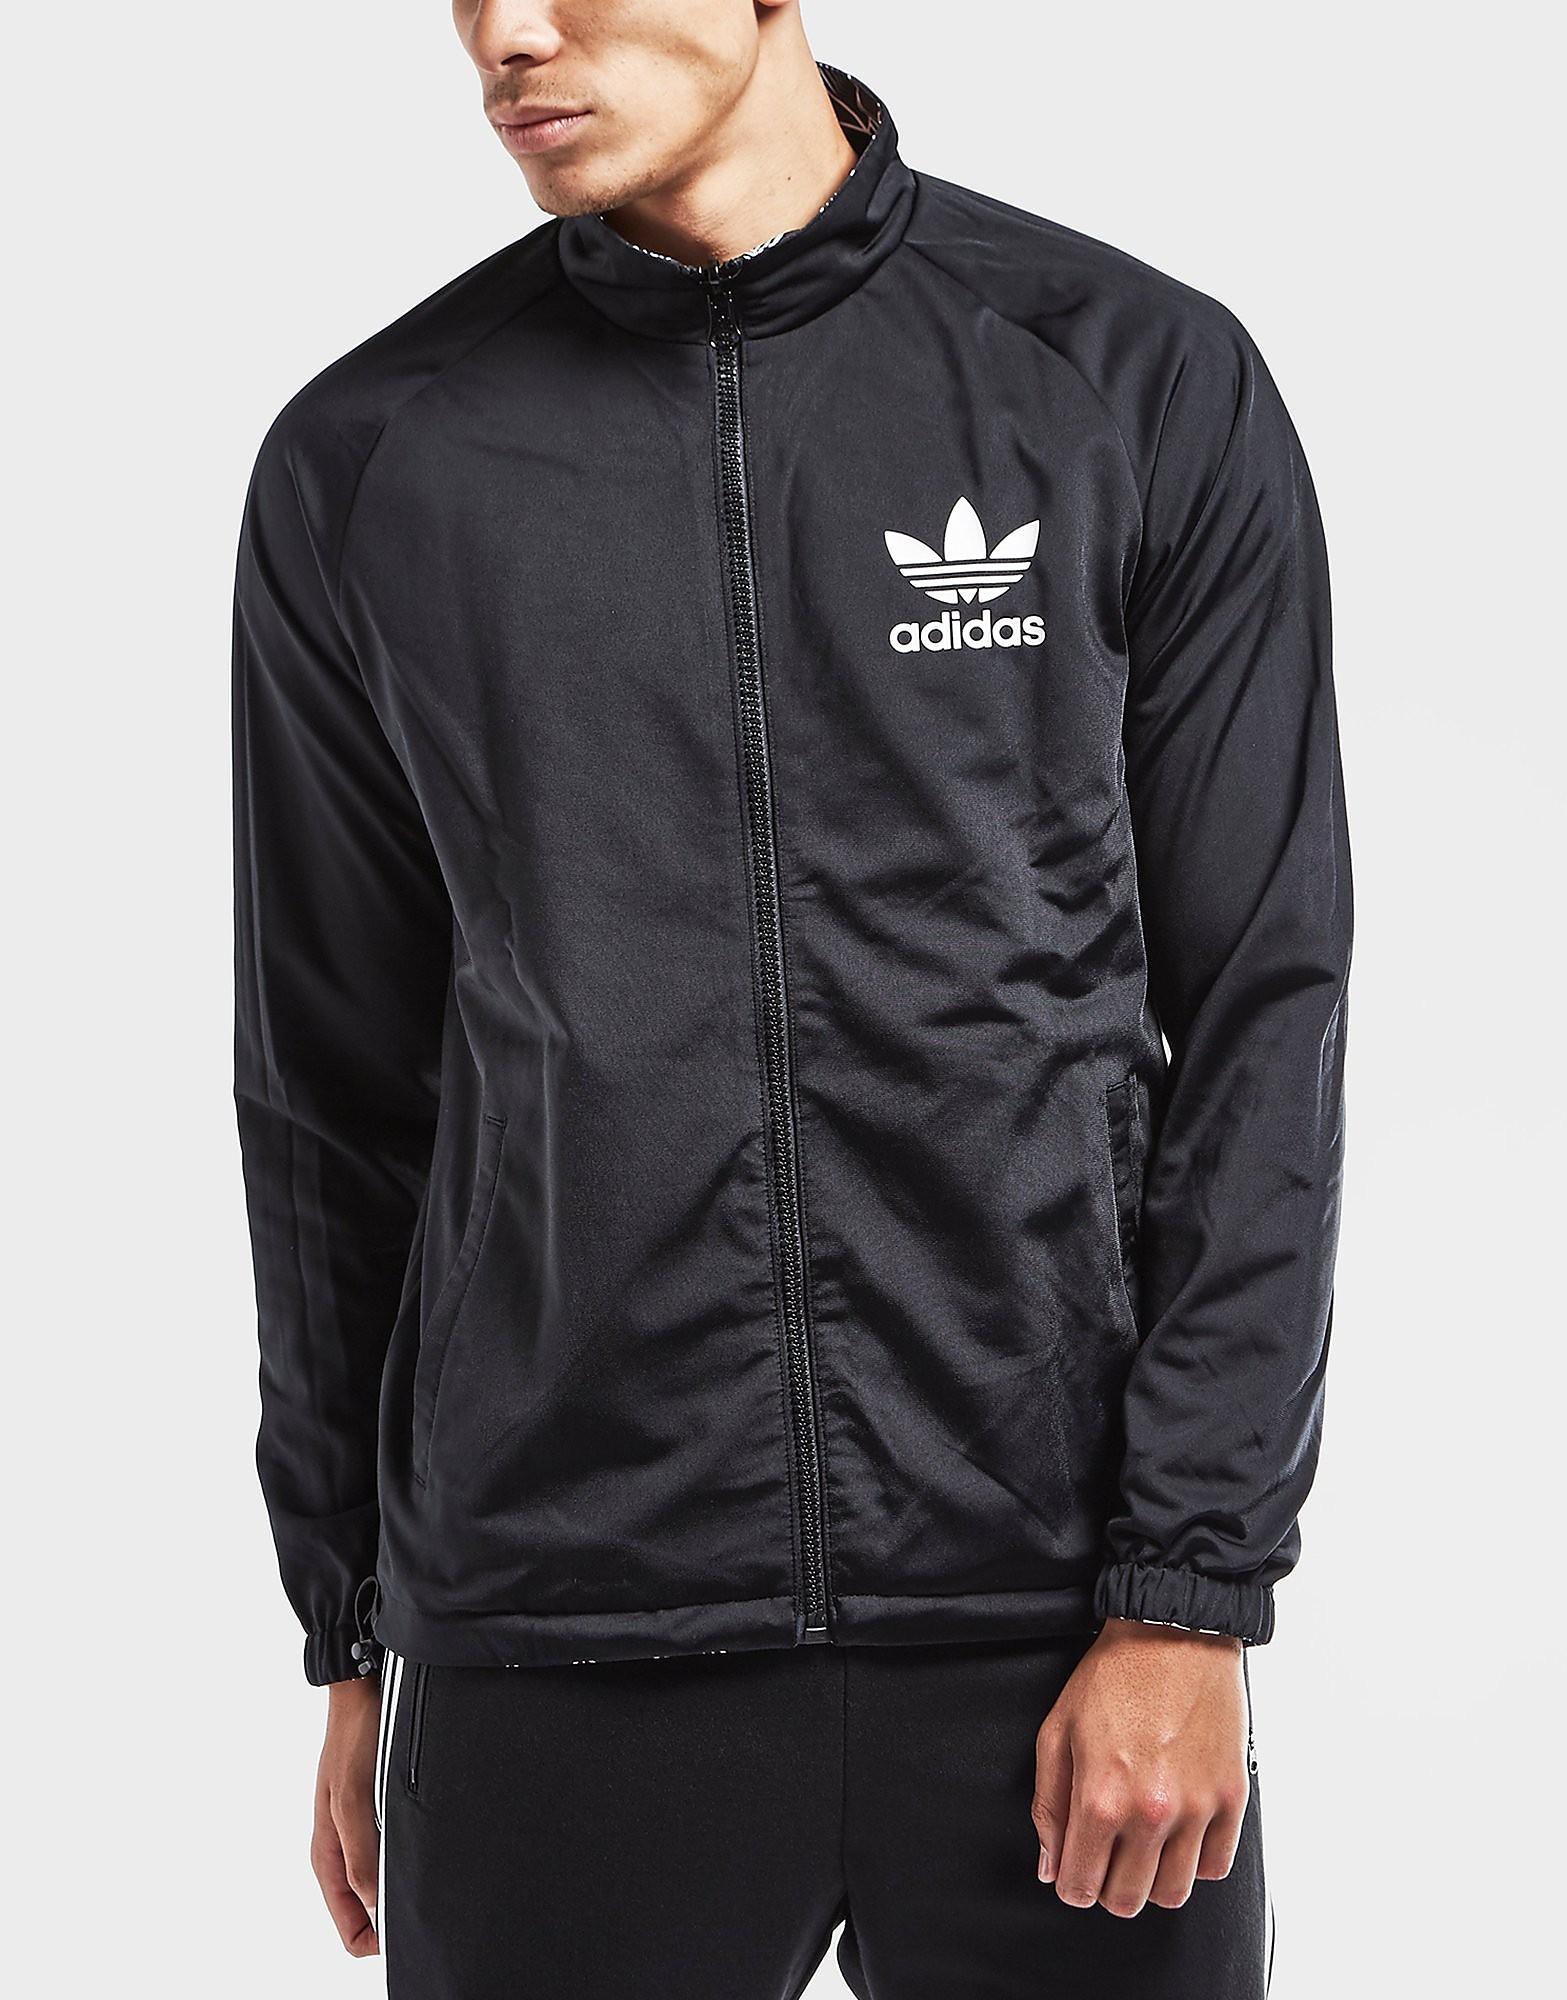 adidas Originals Soccer Reversible Lightweight Jacket